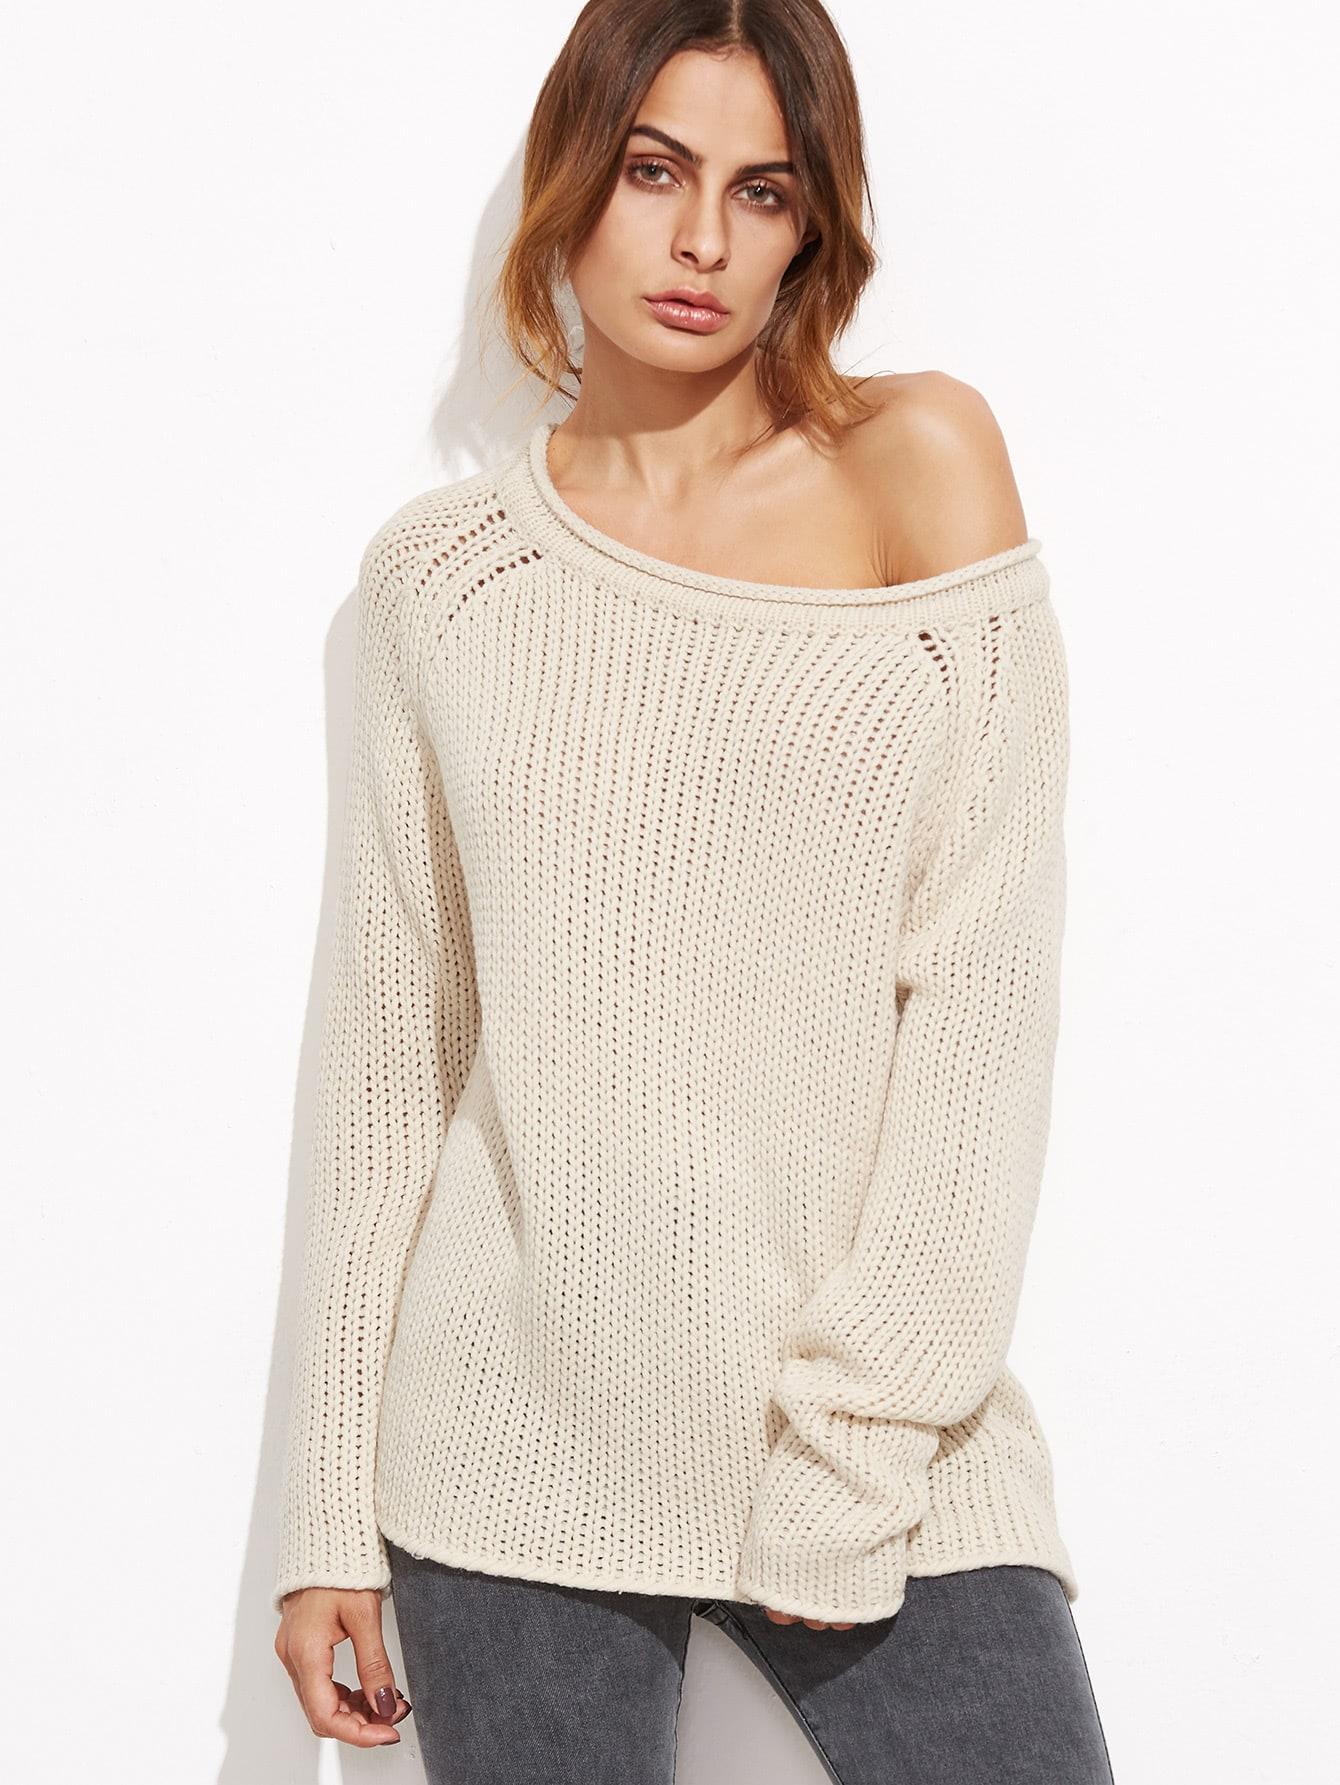 Apricot Boat Neck Raglan Sleeve Loose Knit Sweater sweater161007469